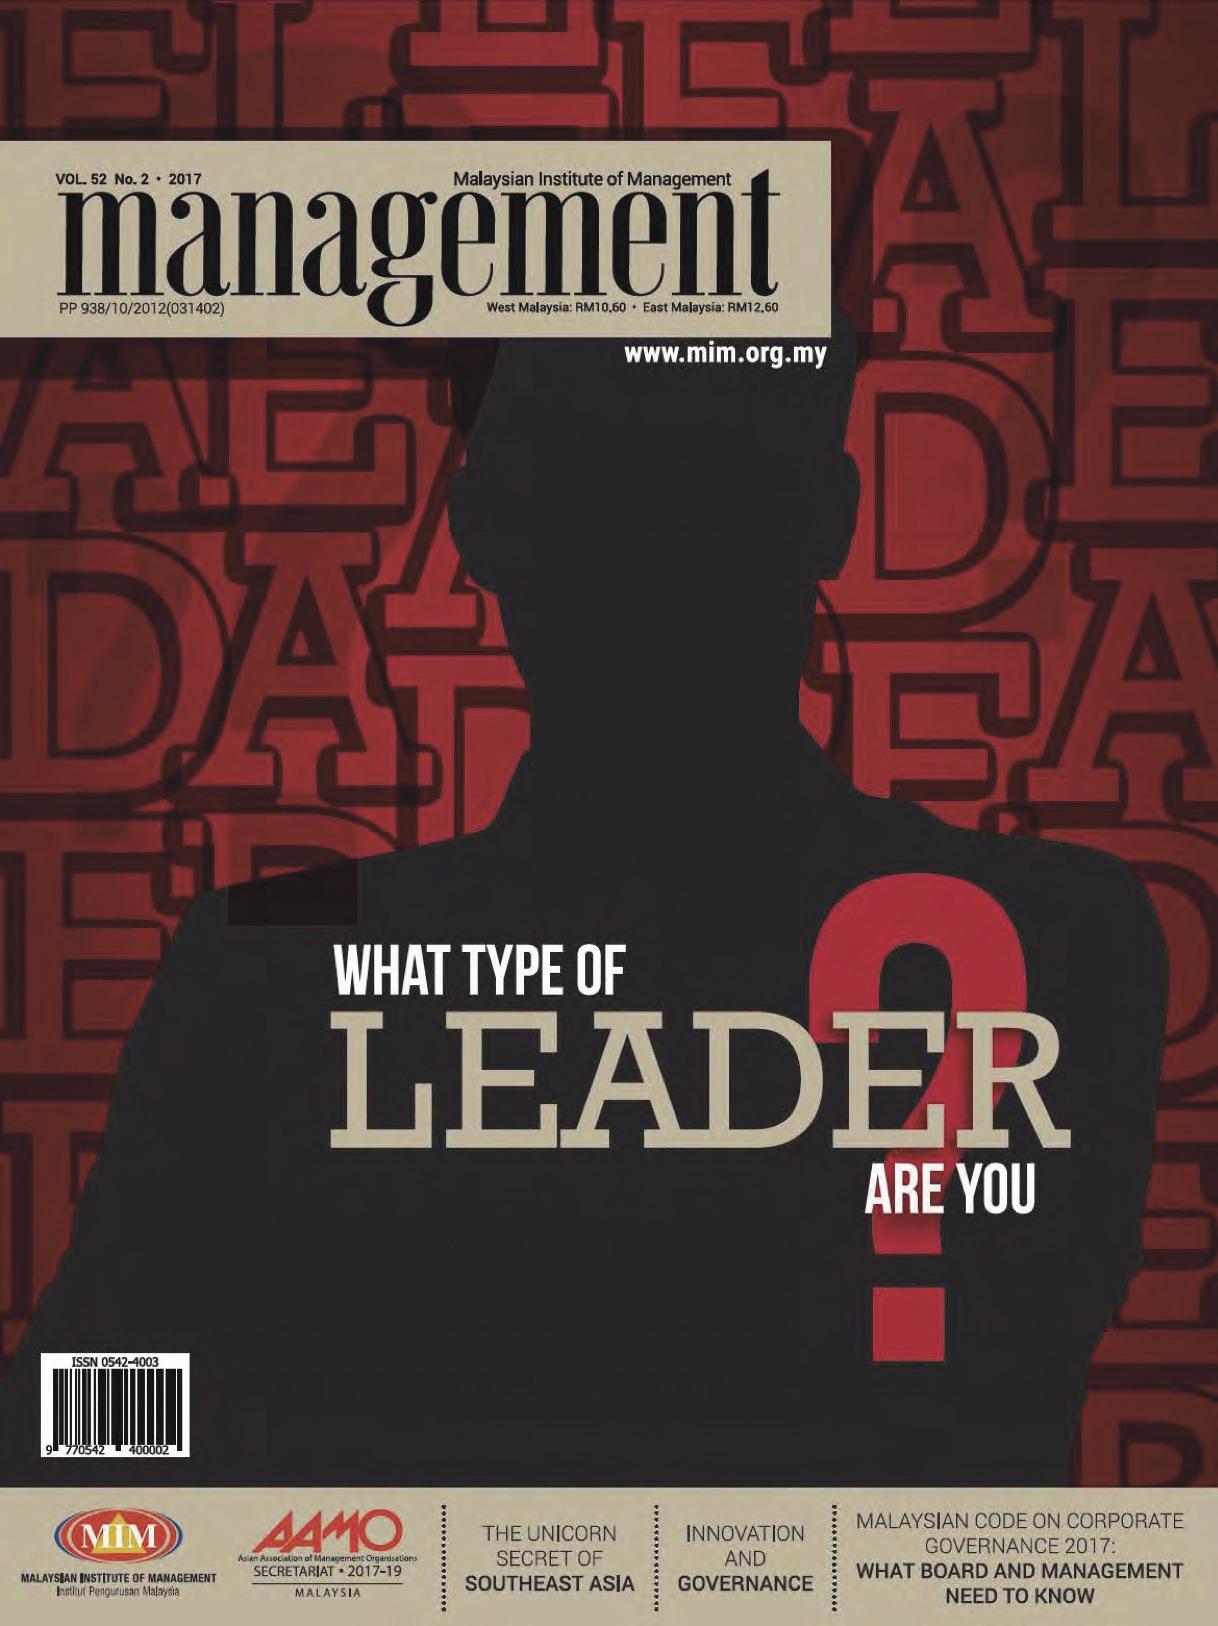 SUSTAINING IMPACT AND REMAINING RELEVANT - MIM Management Magazine, pg 18